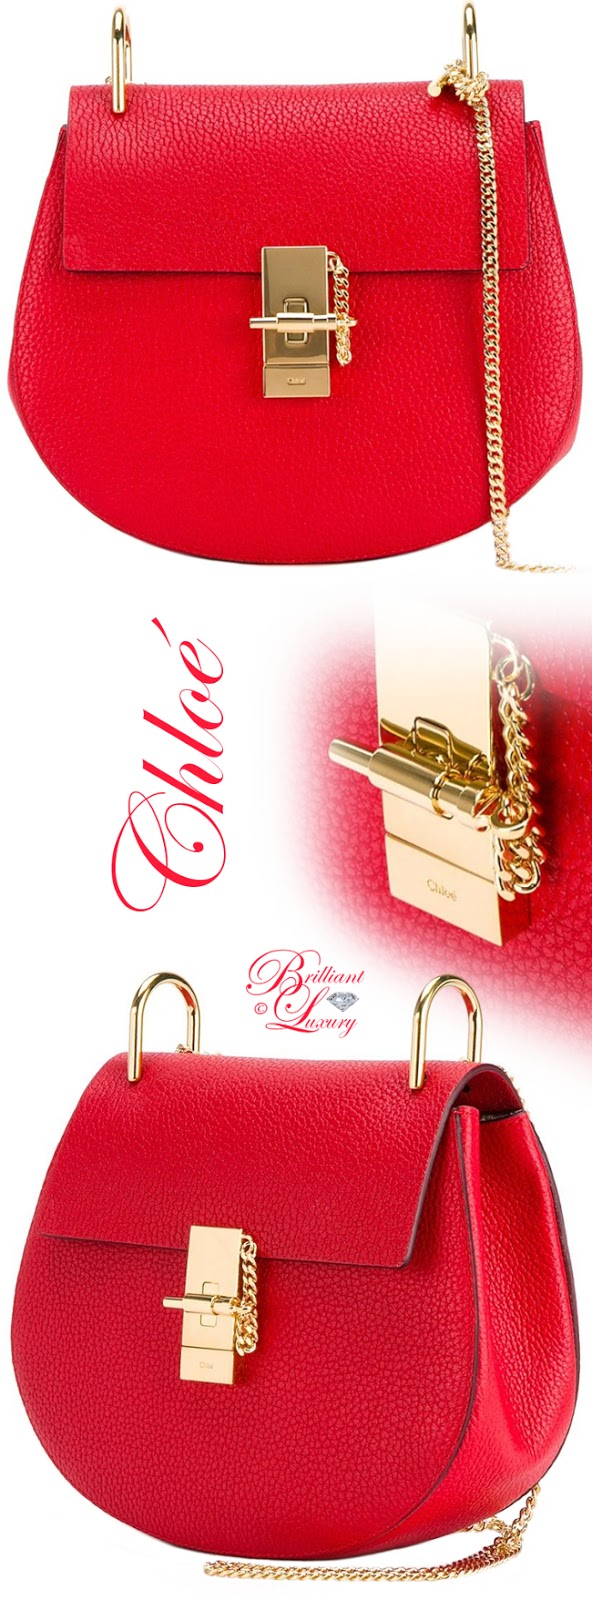 Brilliant Luxury ♦ Chloé Small Drew Grained Leather Shoulder Bag